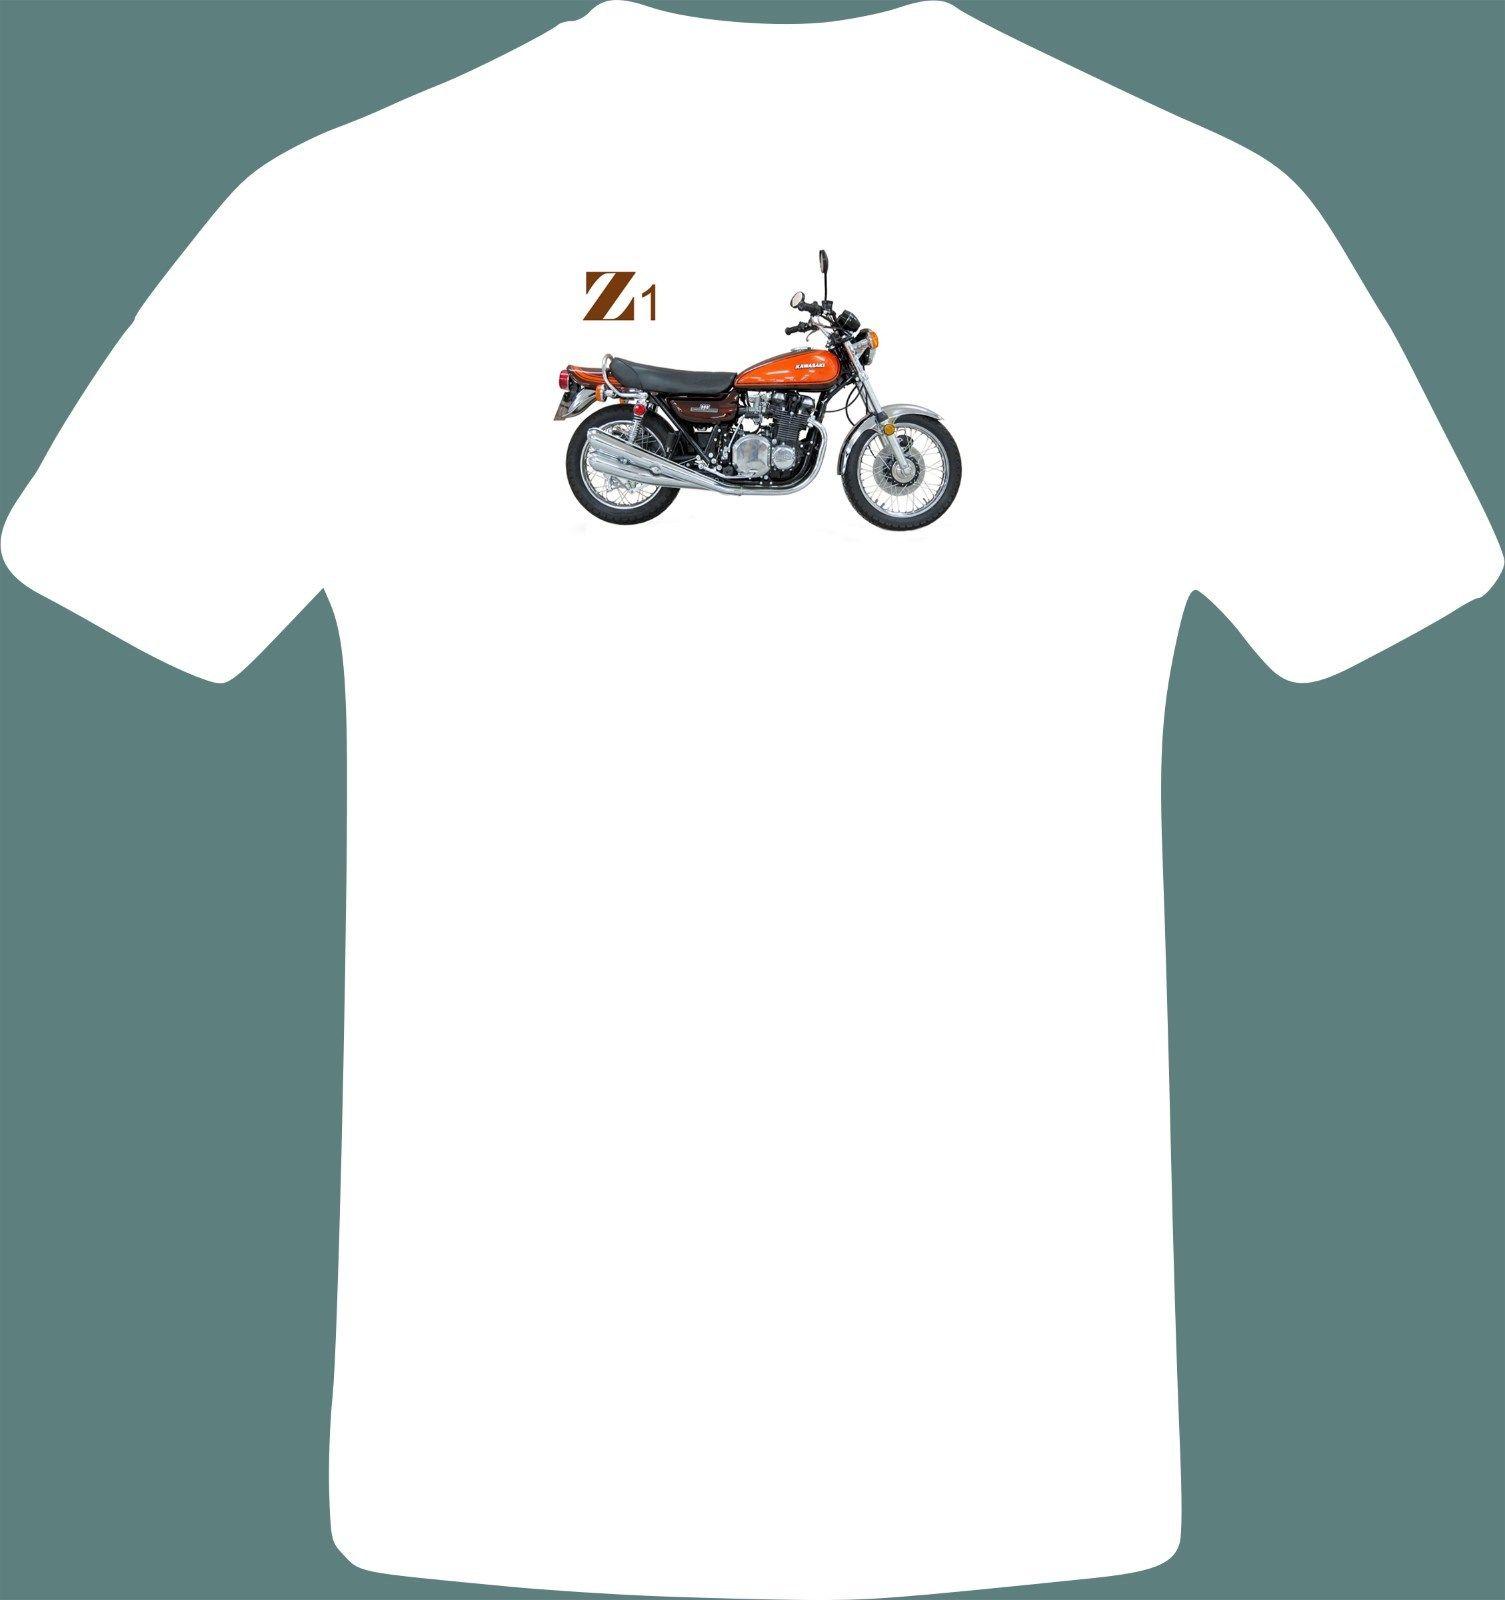 2018 Hot sale Fashion Japanese Motorcycle Z1 900 T Shirt Tee shirt